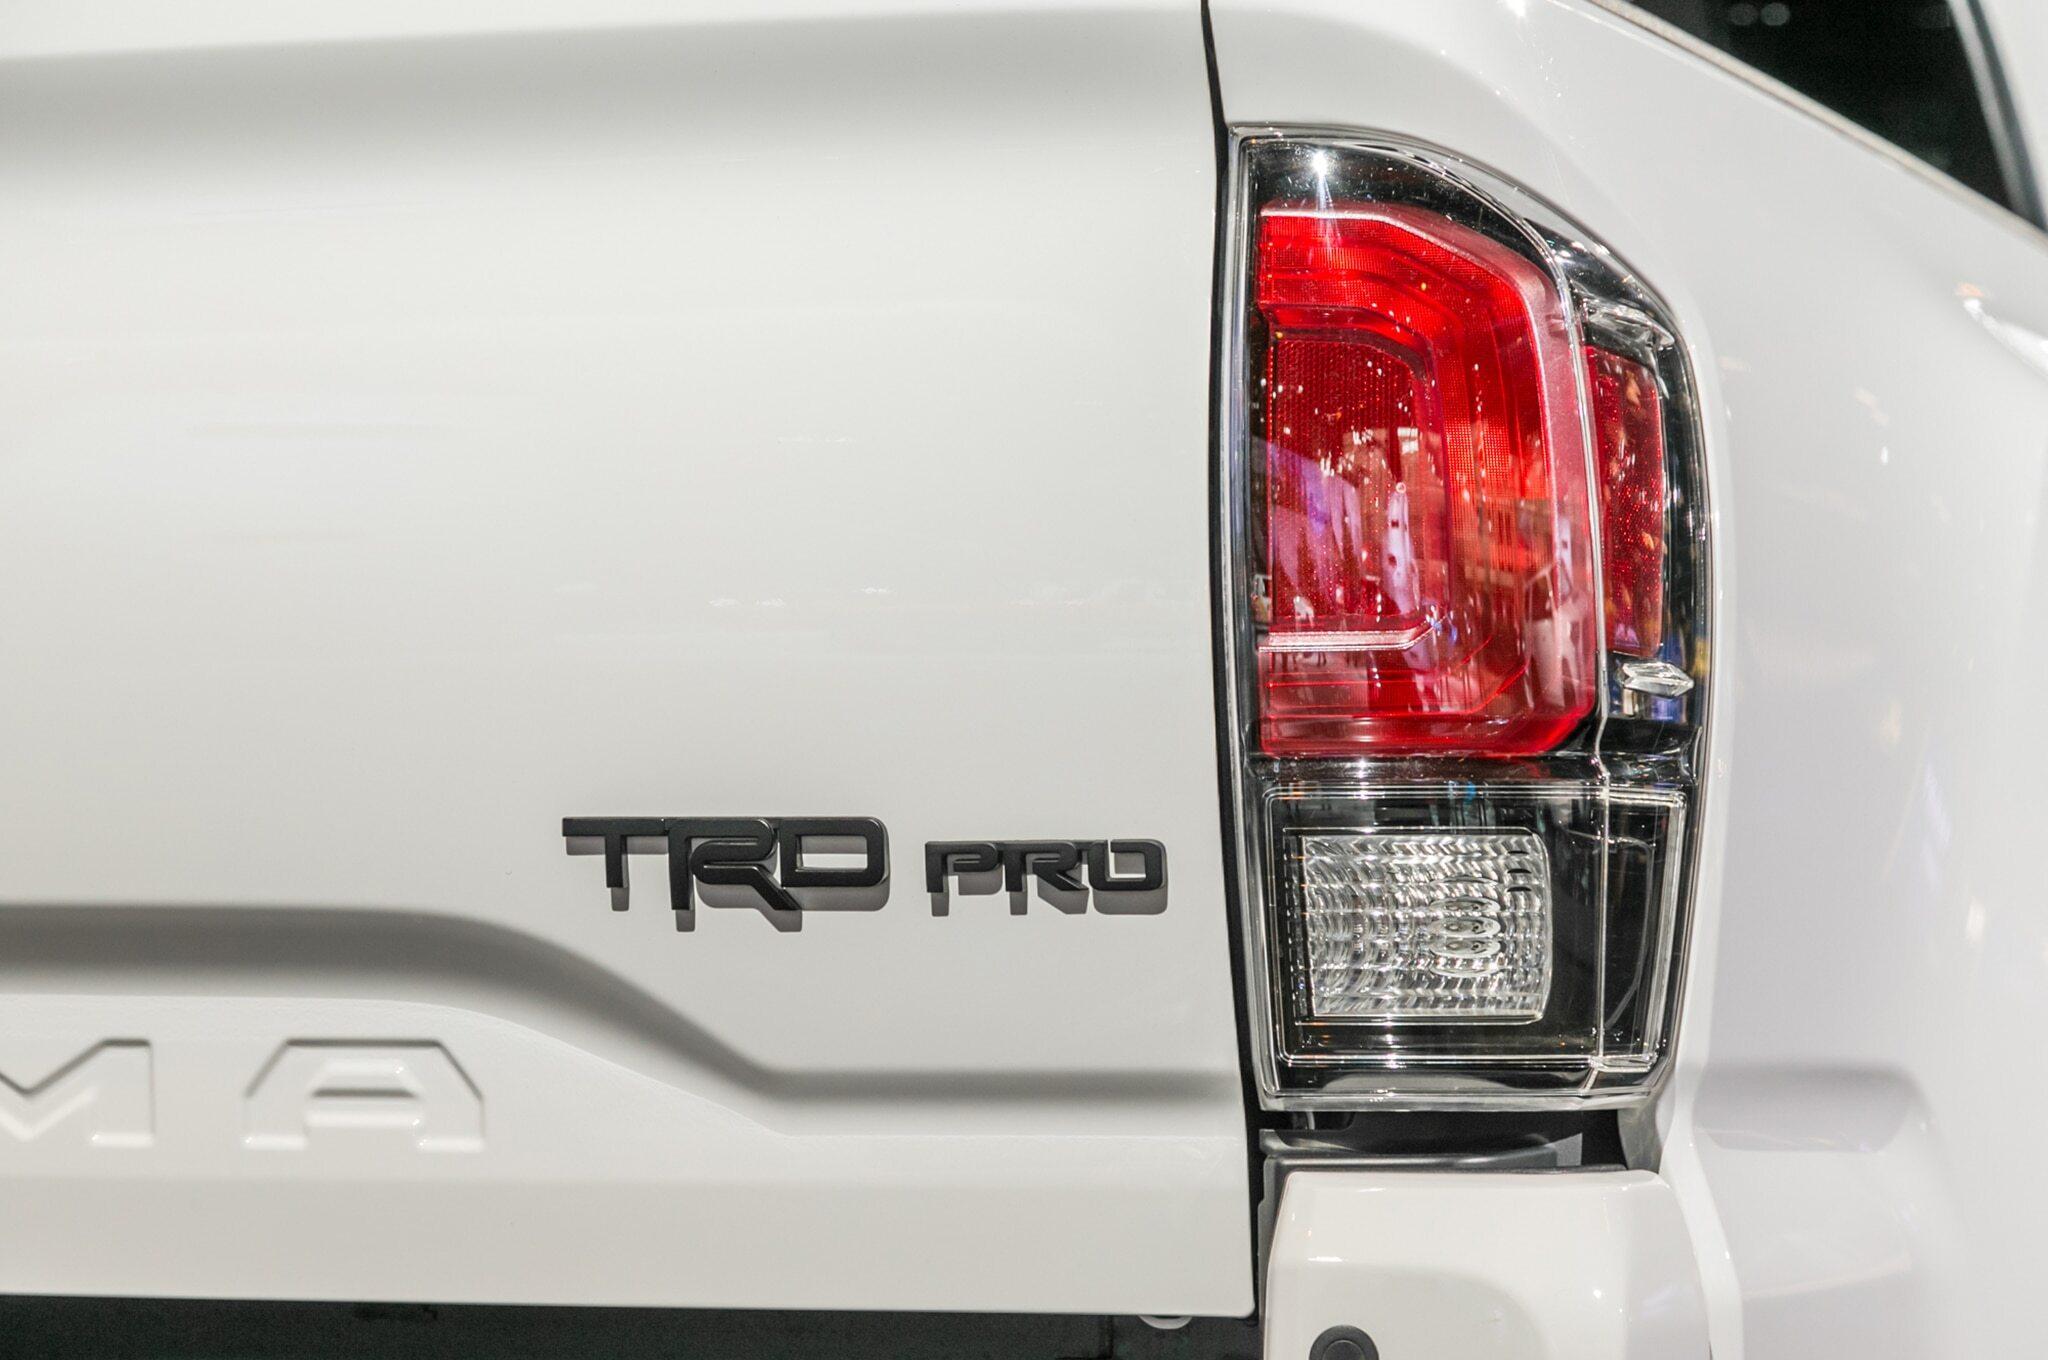 2019-Toyota-Tacoma-TRD-Pro-taillight